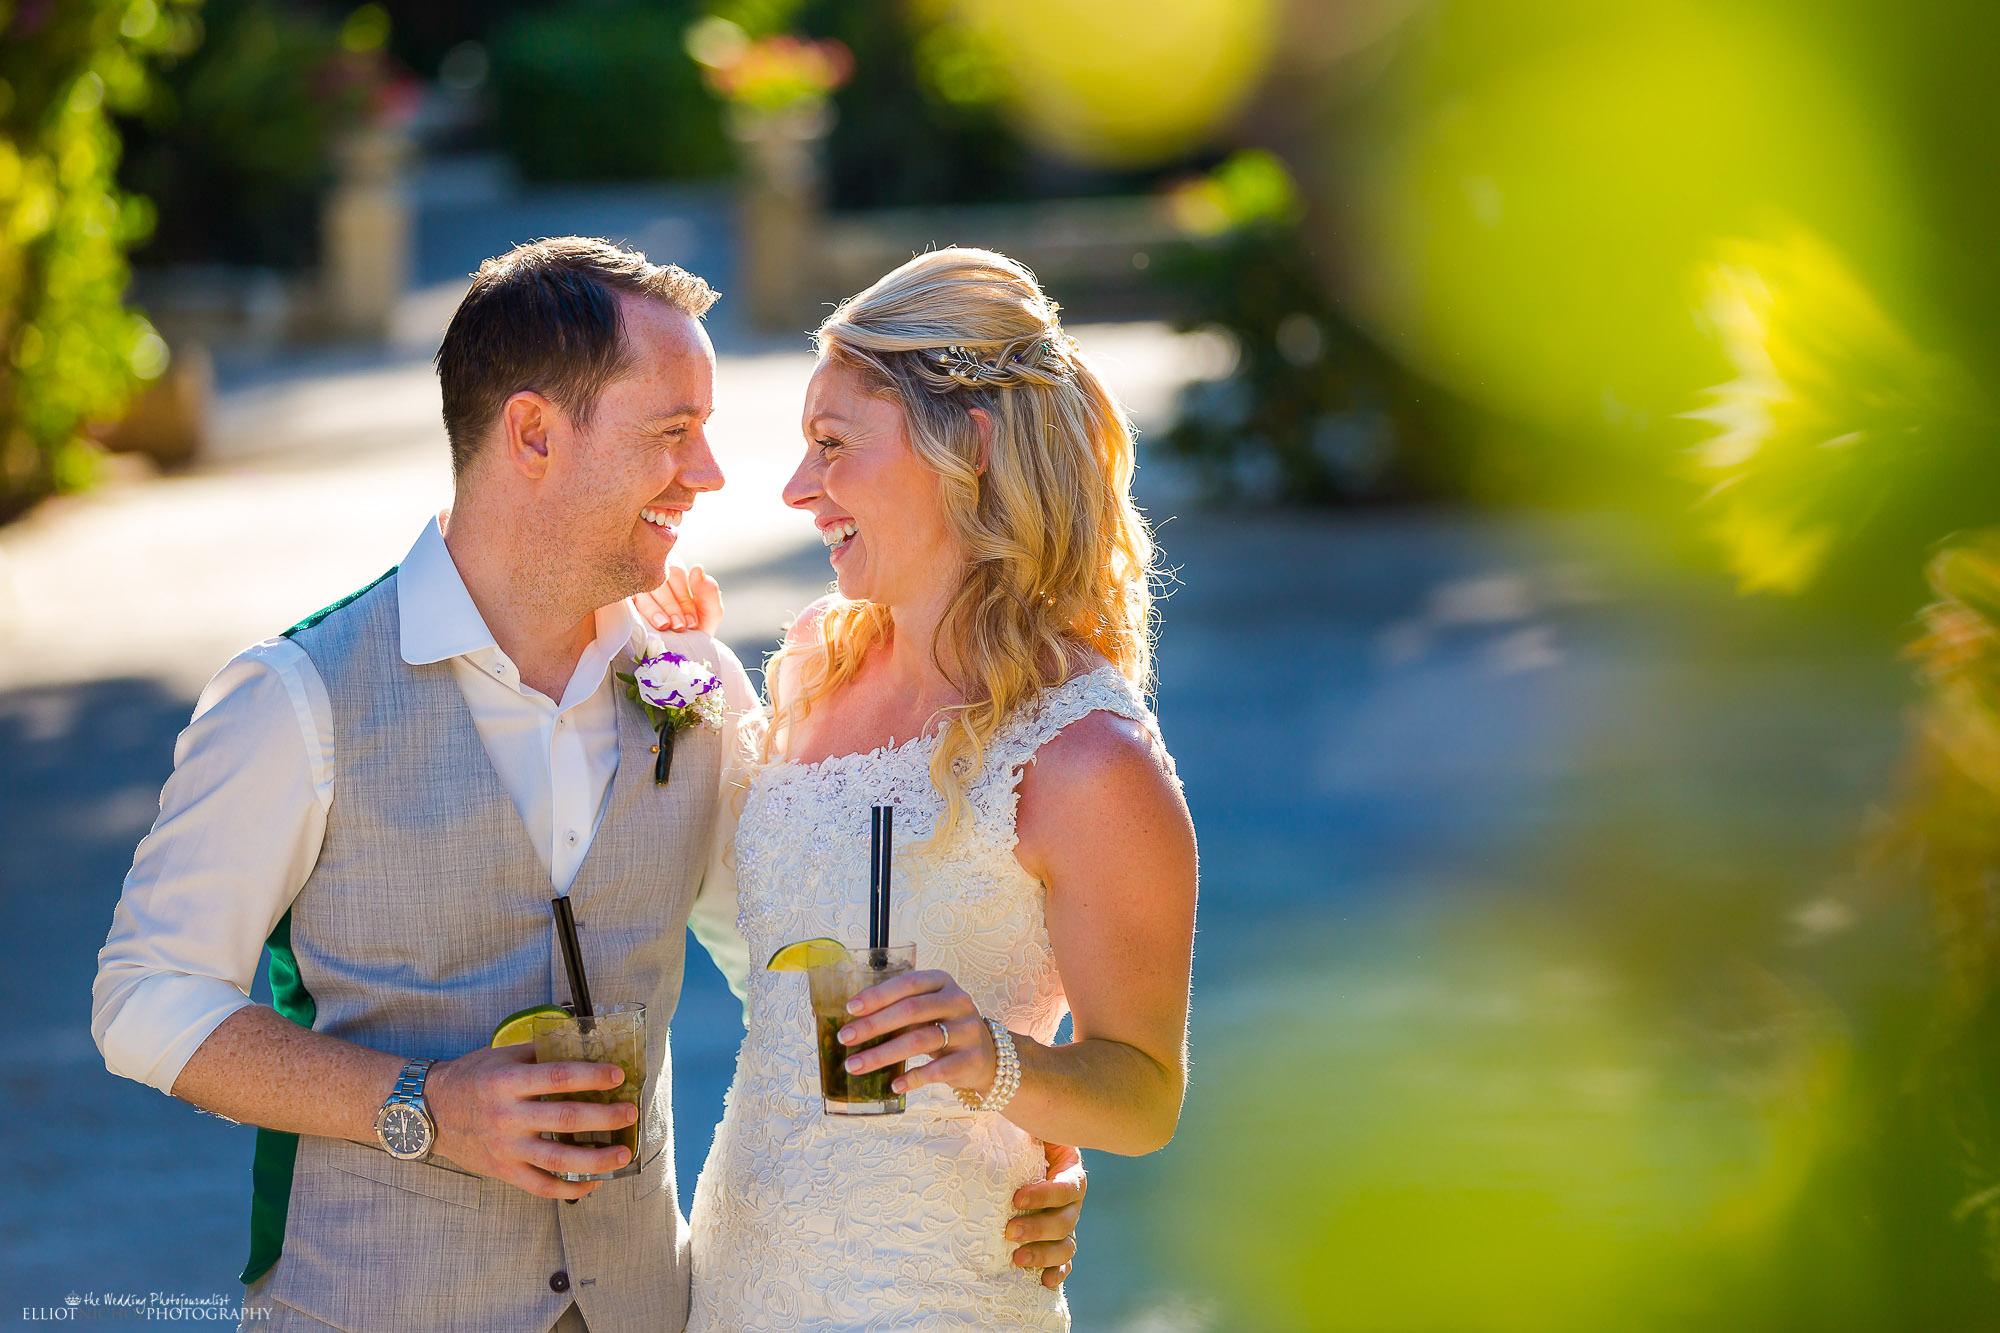 newlyweds-bride-groom-portrait-wedding-photographer-North-East-UK